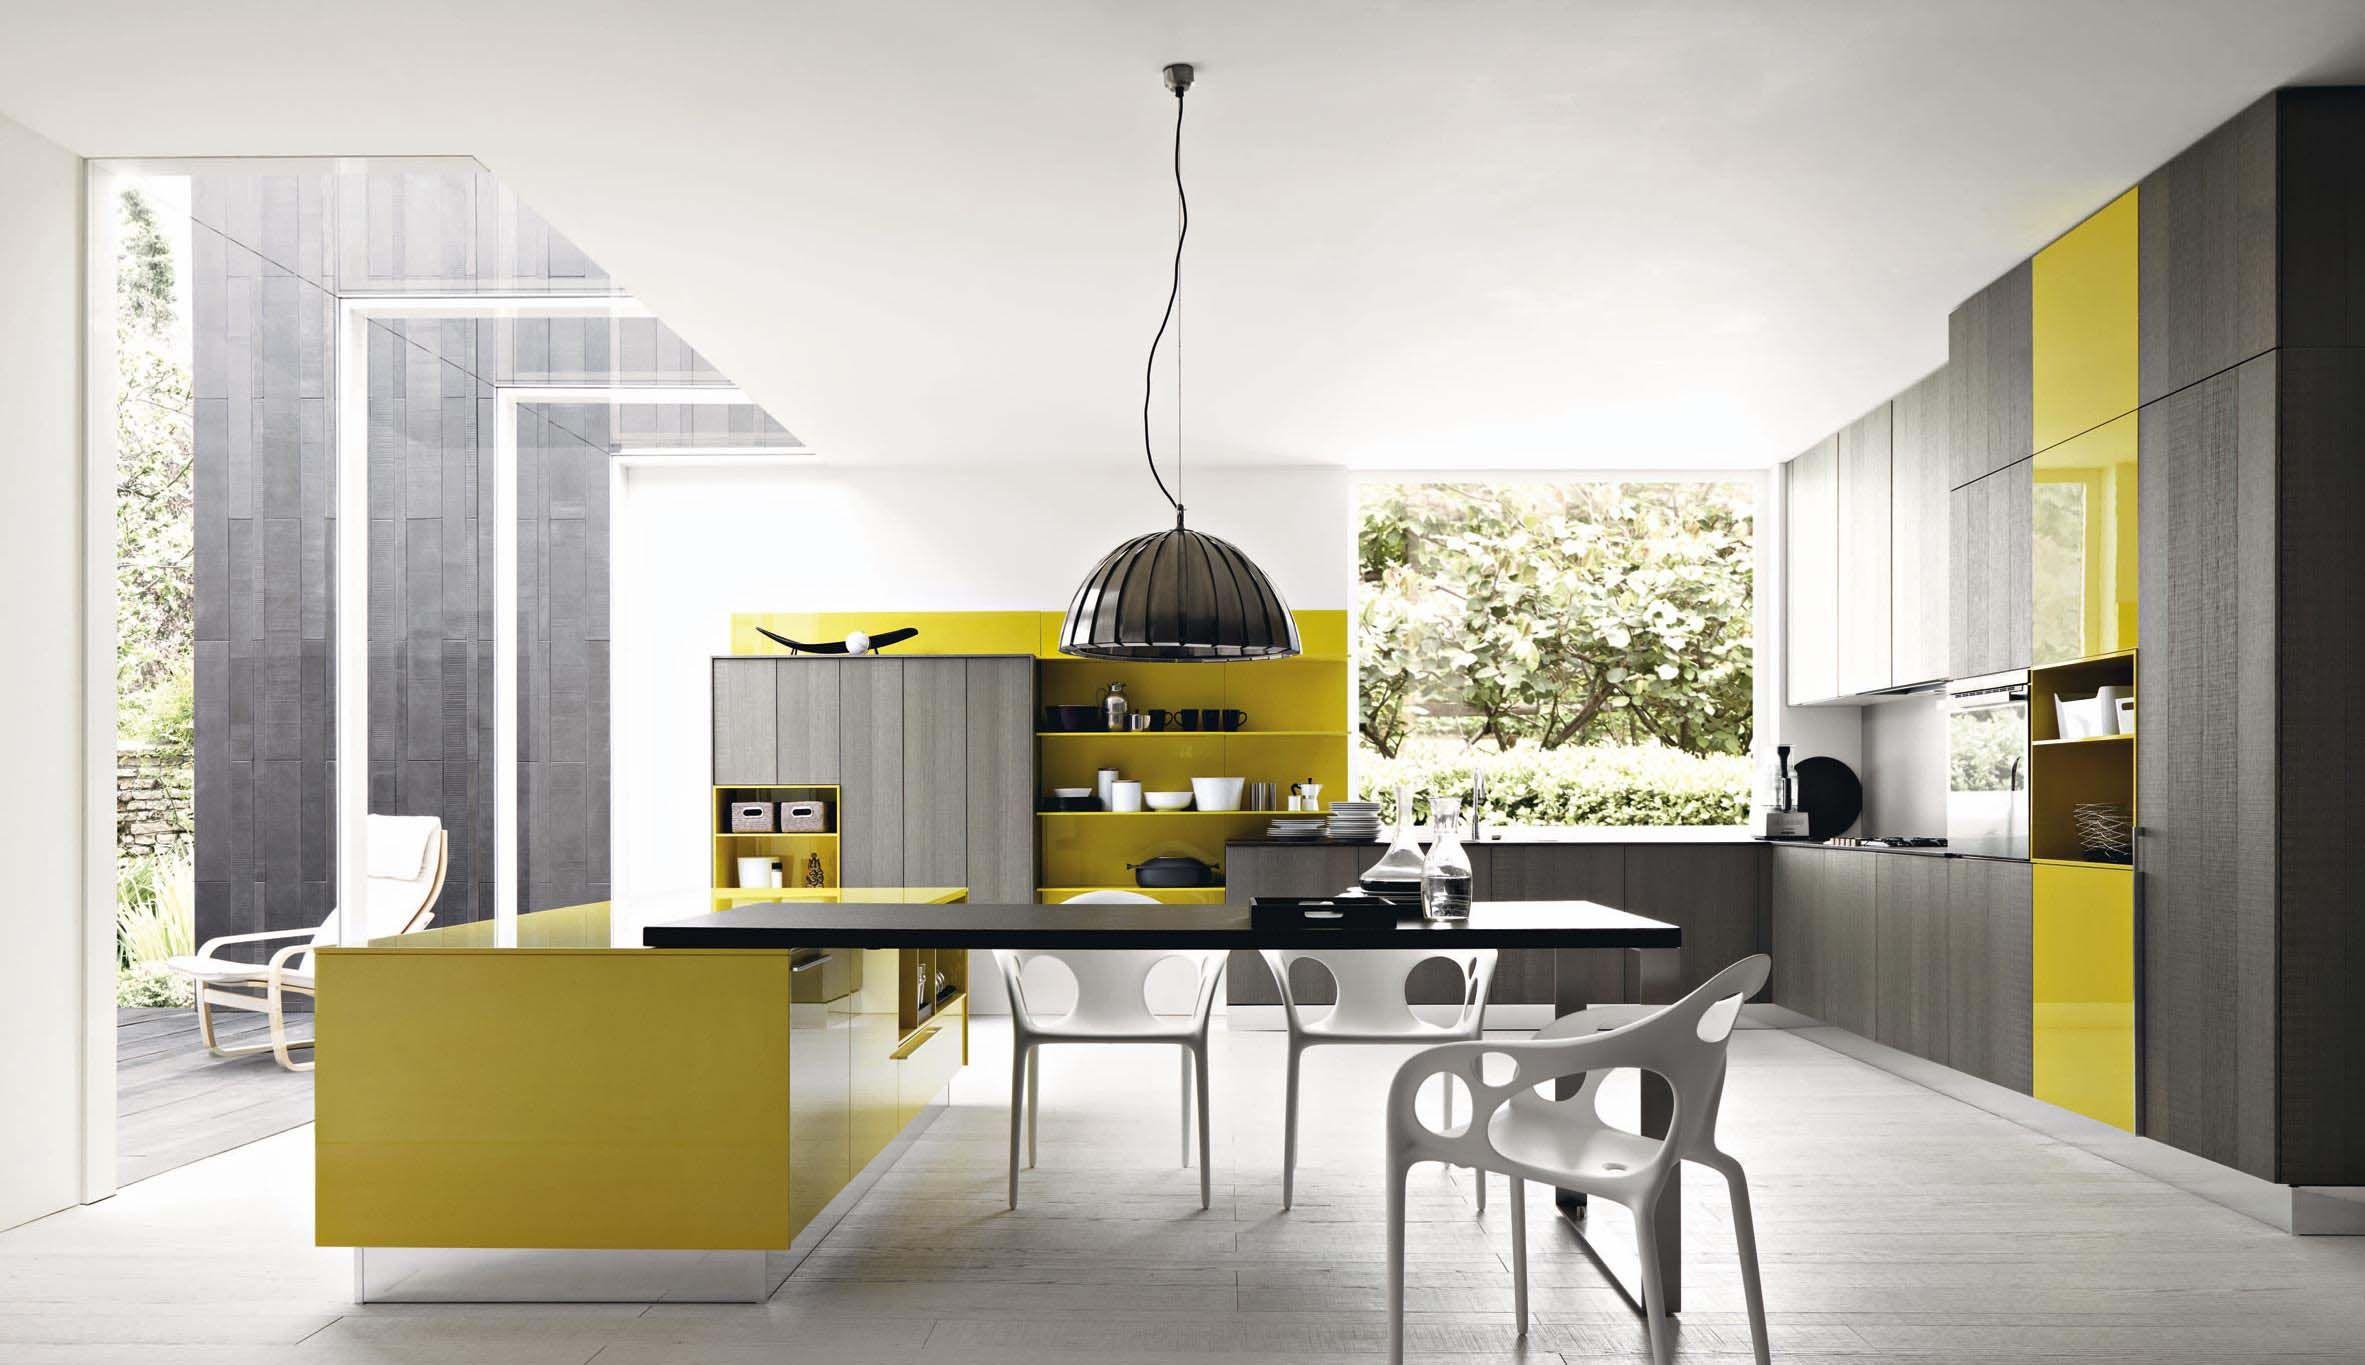 Küche interieur farbschemata kalea di cesar cesarcucine cucine arredamento design kitchen